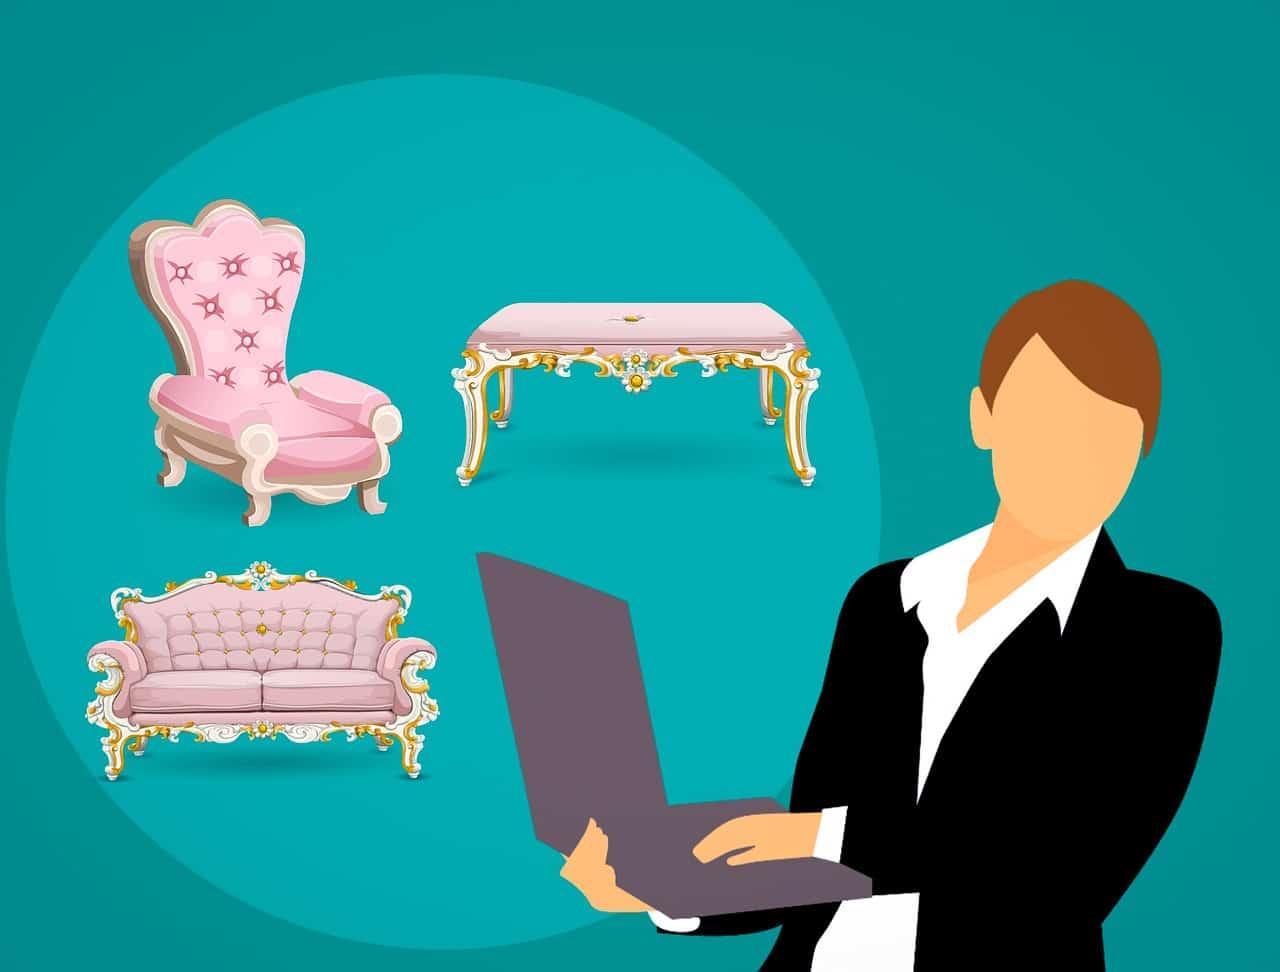 קניית רהיטים אונליין